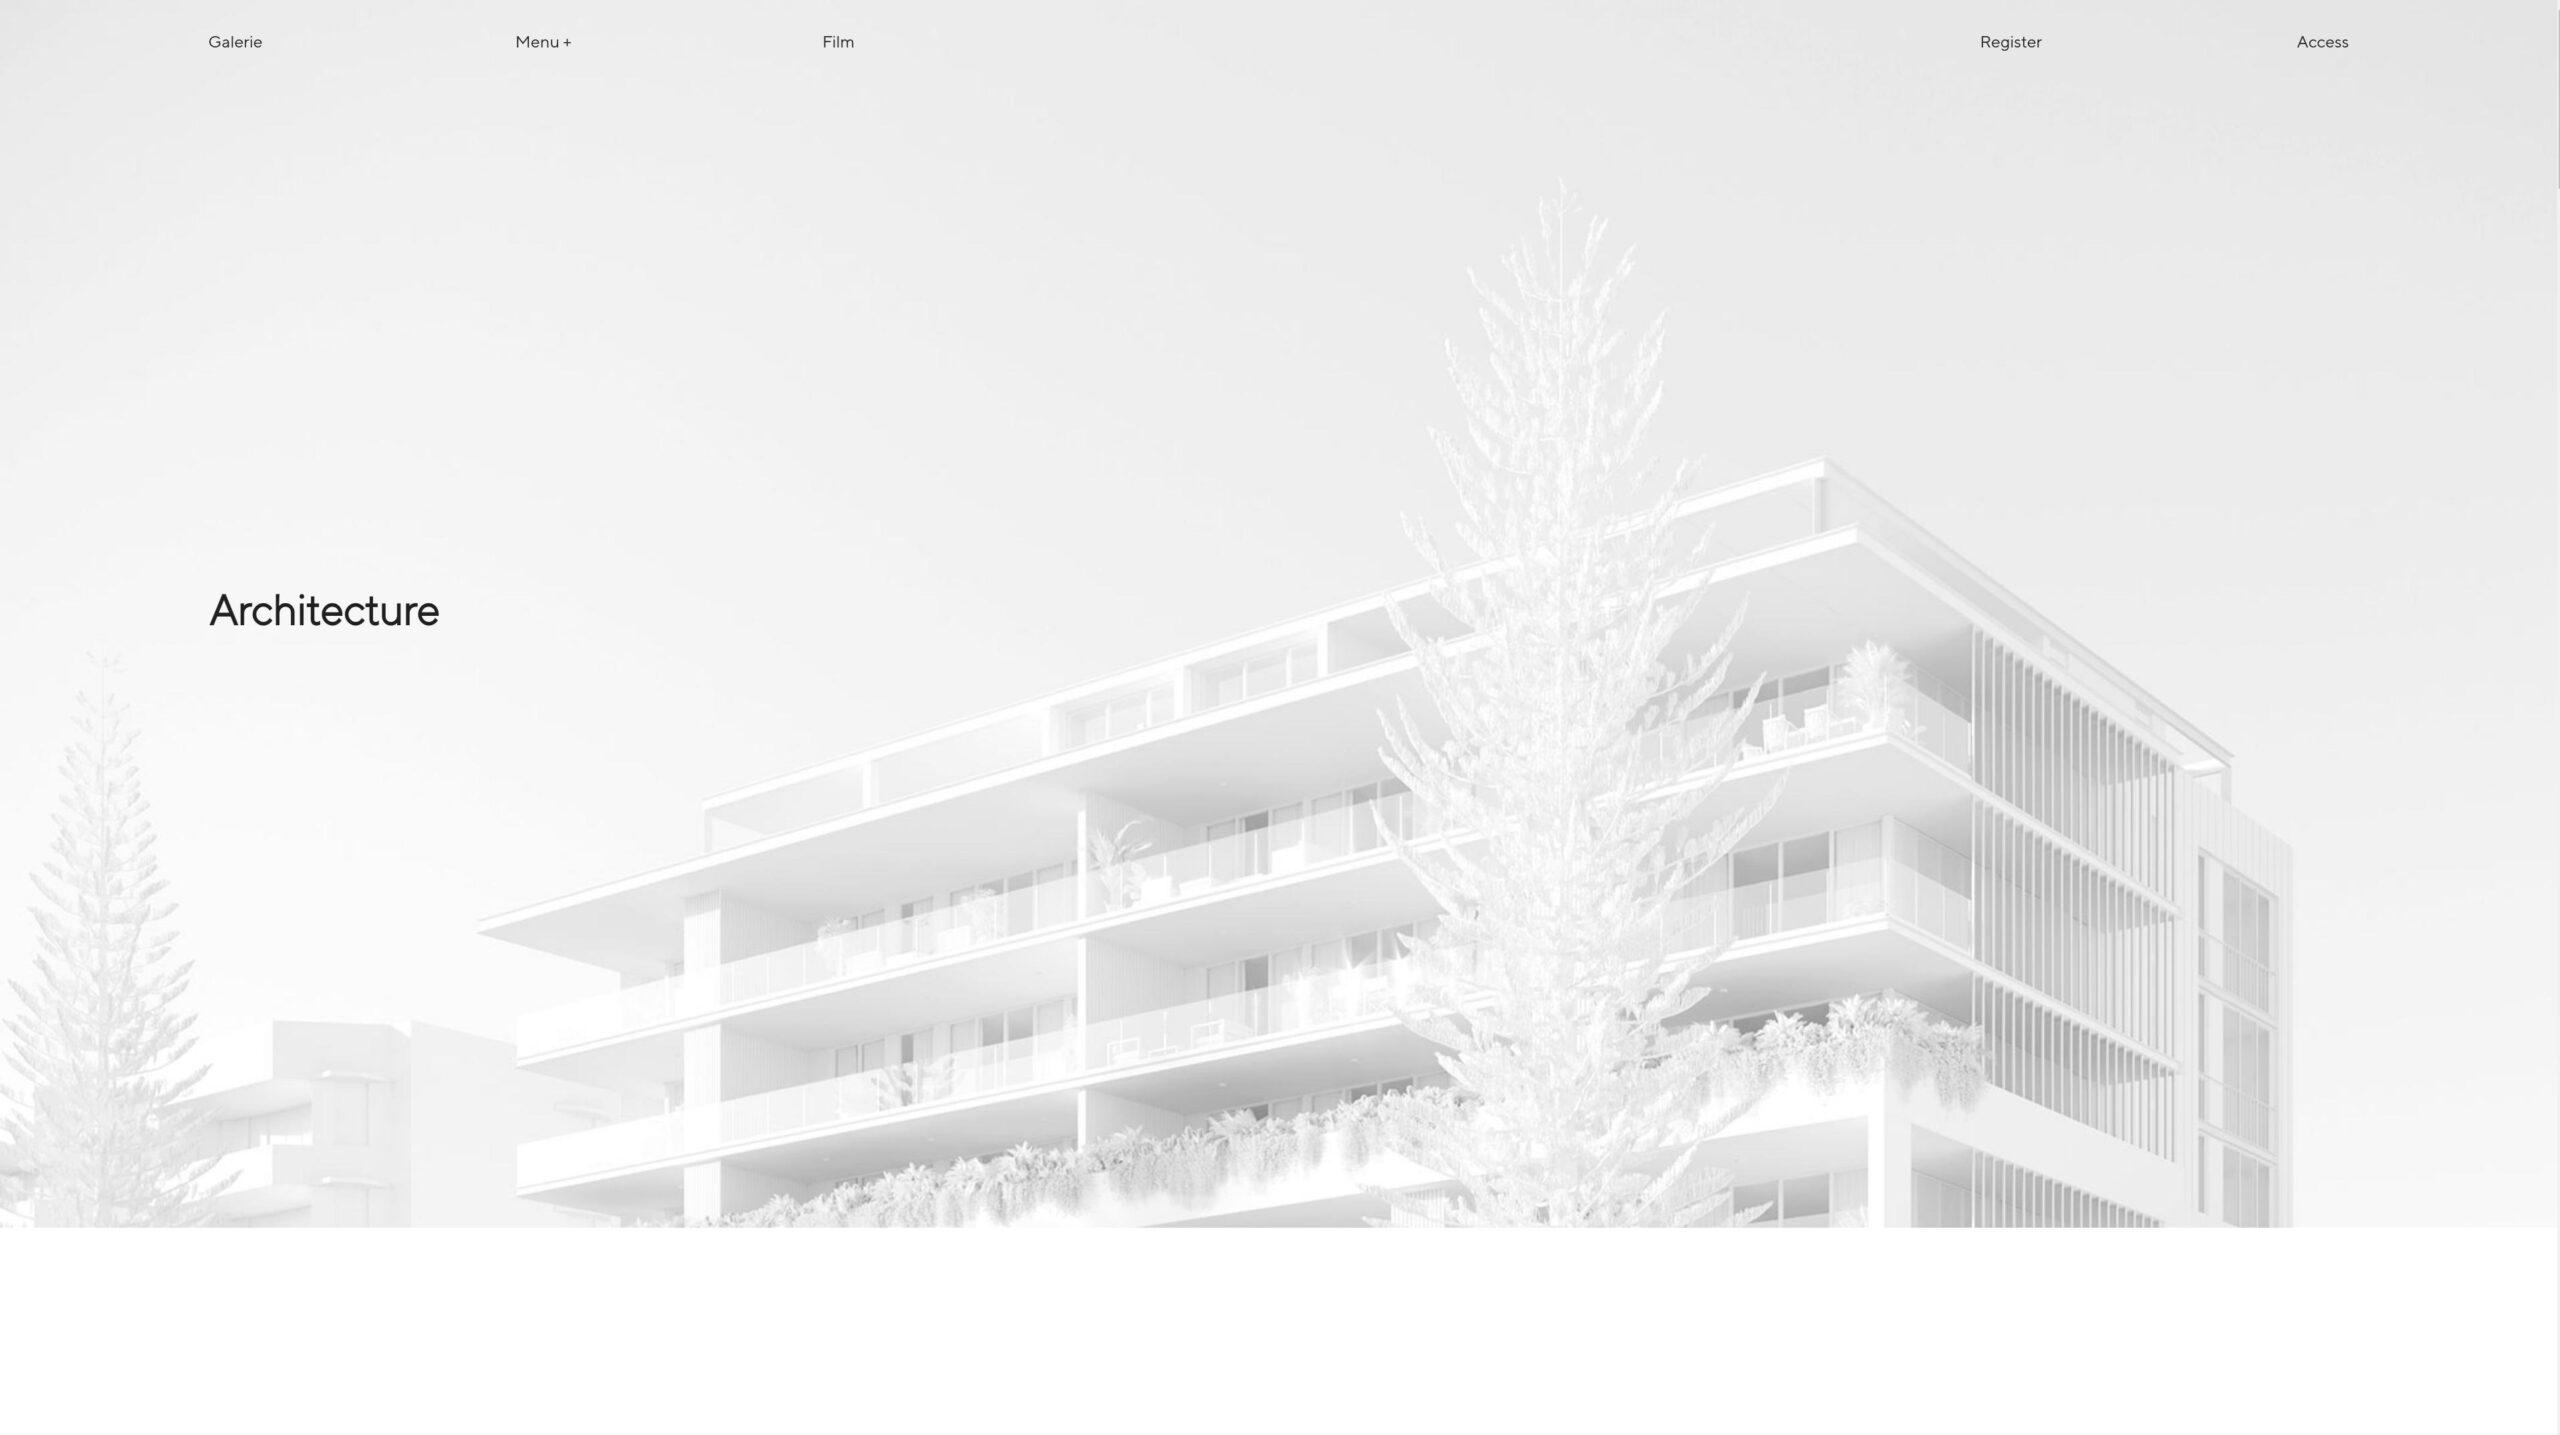 Orpetron Web Design Awards - Galerie - Web Design Awards Inspiration Trends UI UX